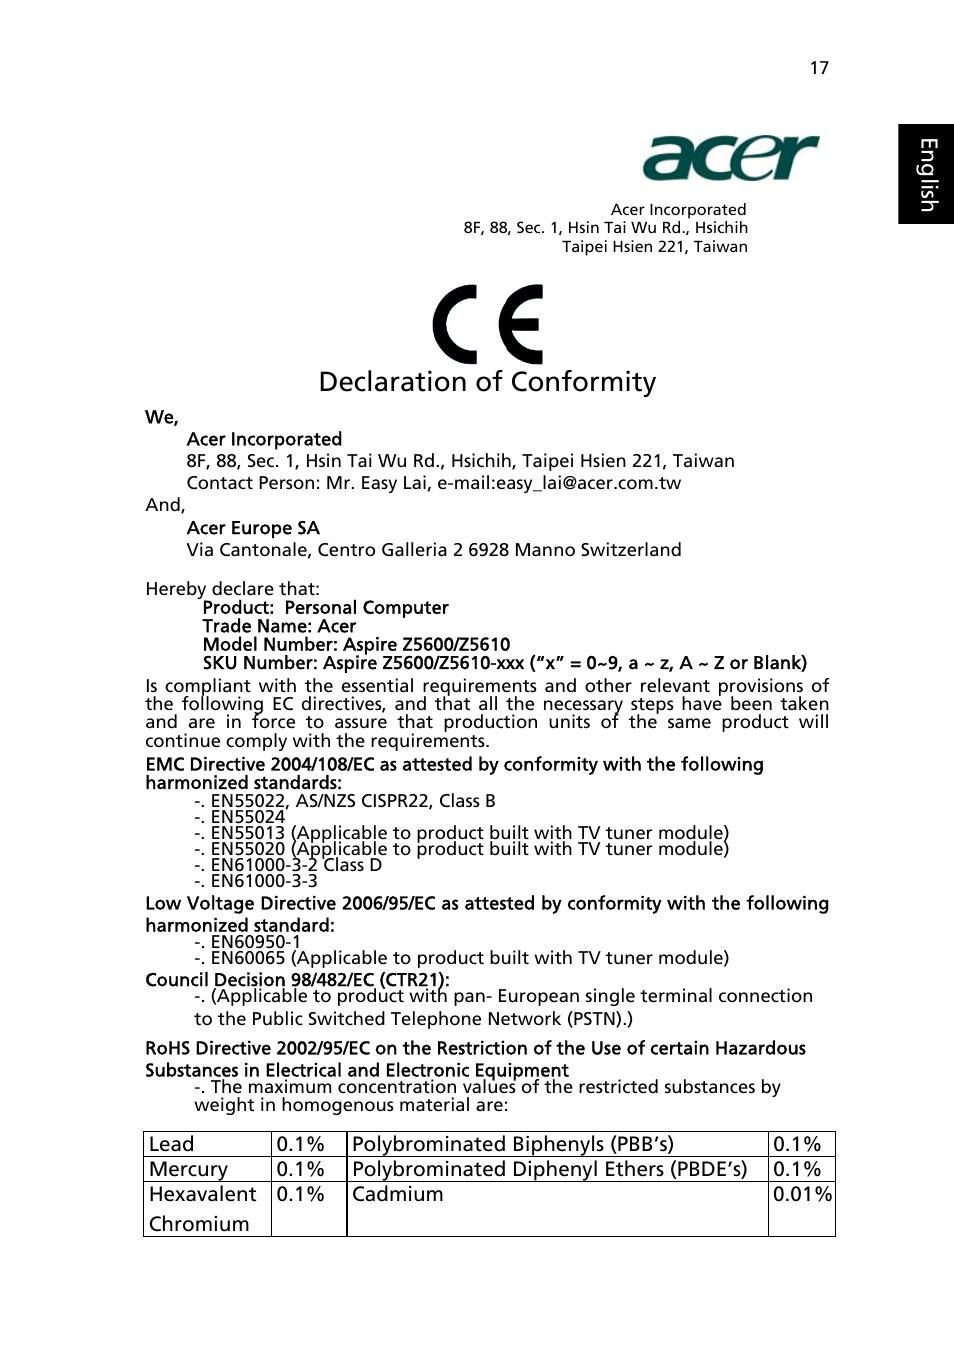 declaration of conformity acer aspire z5610 user manual page 27 rh manualsdir com acer aspire z5610 service manual pdf acer aspire z5600 manual pdf